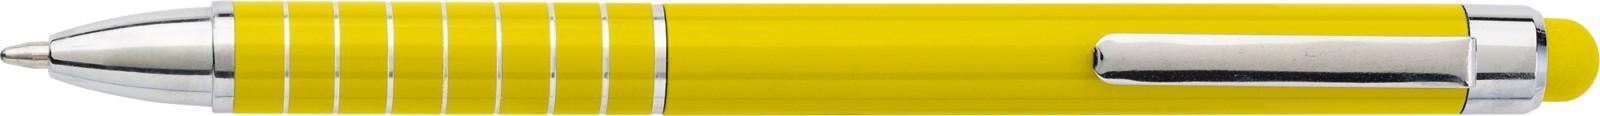 Aluminium lacquered ballpen - Yellow